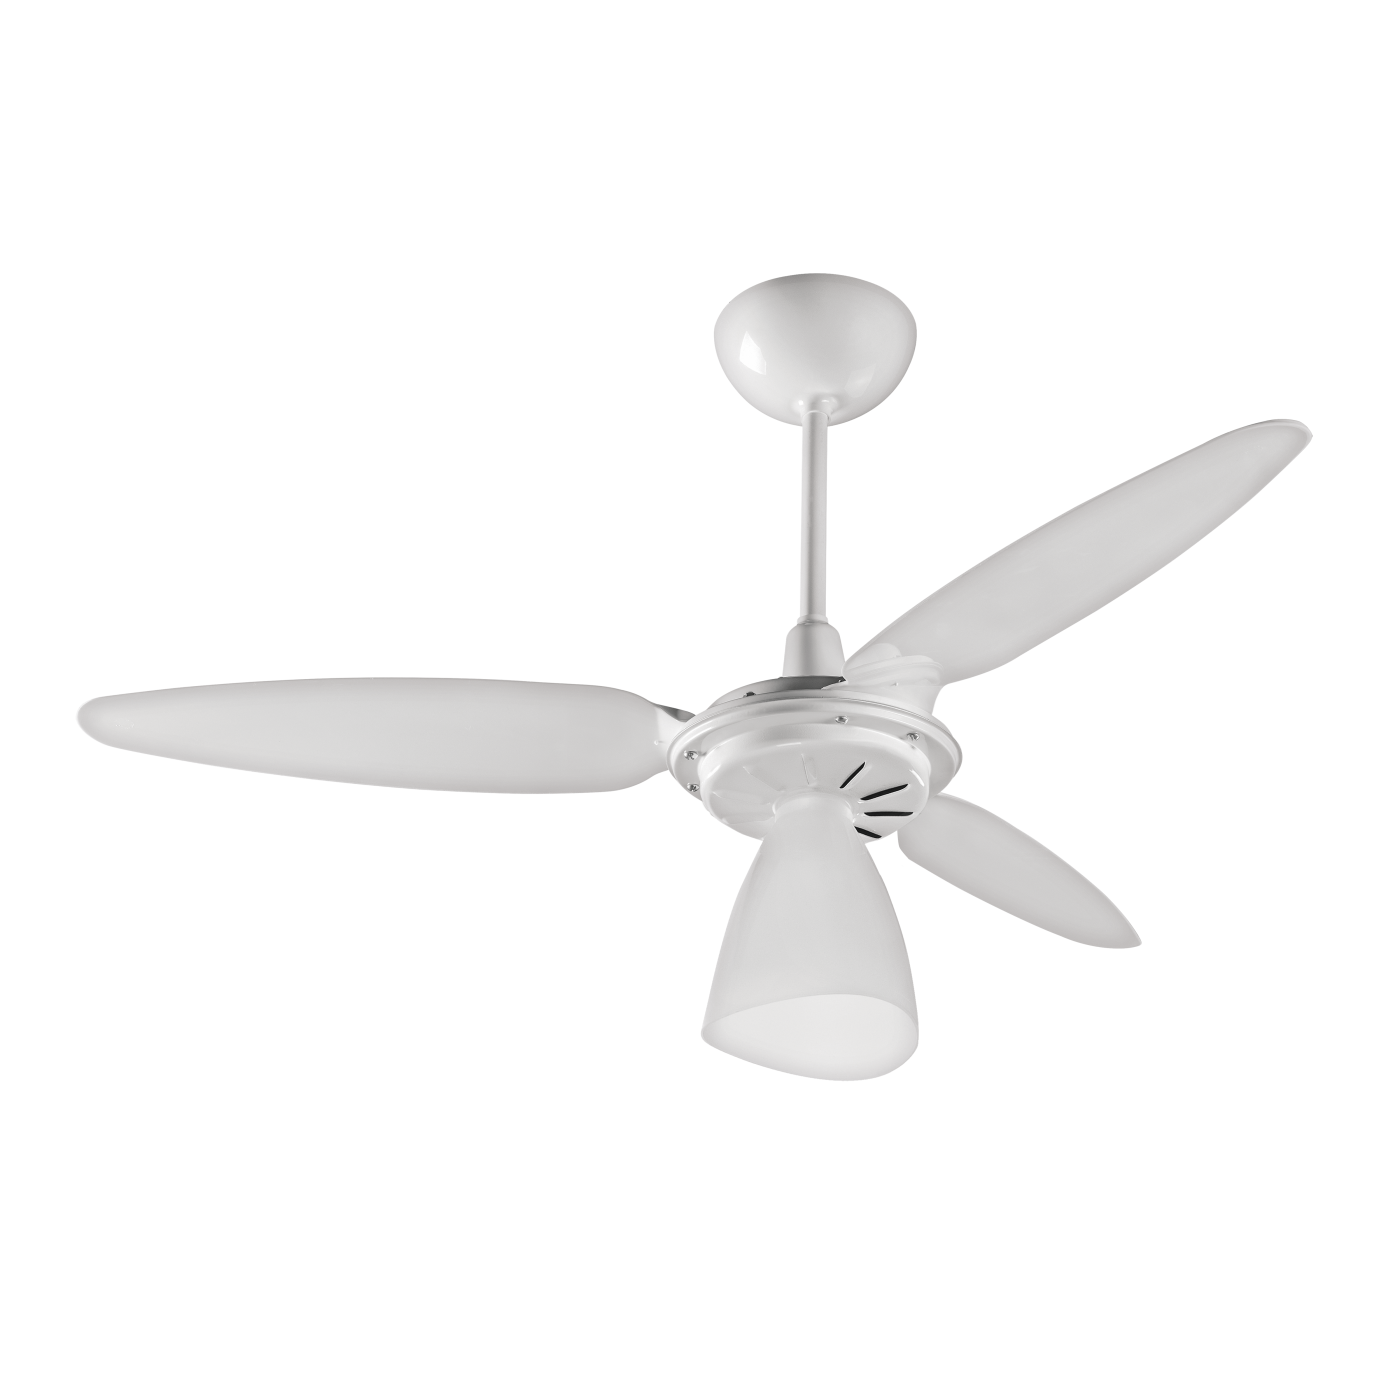 Ventilador Wind Light 3 Pás 127v  - Ventisol